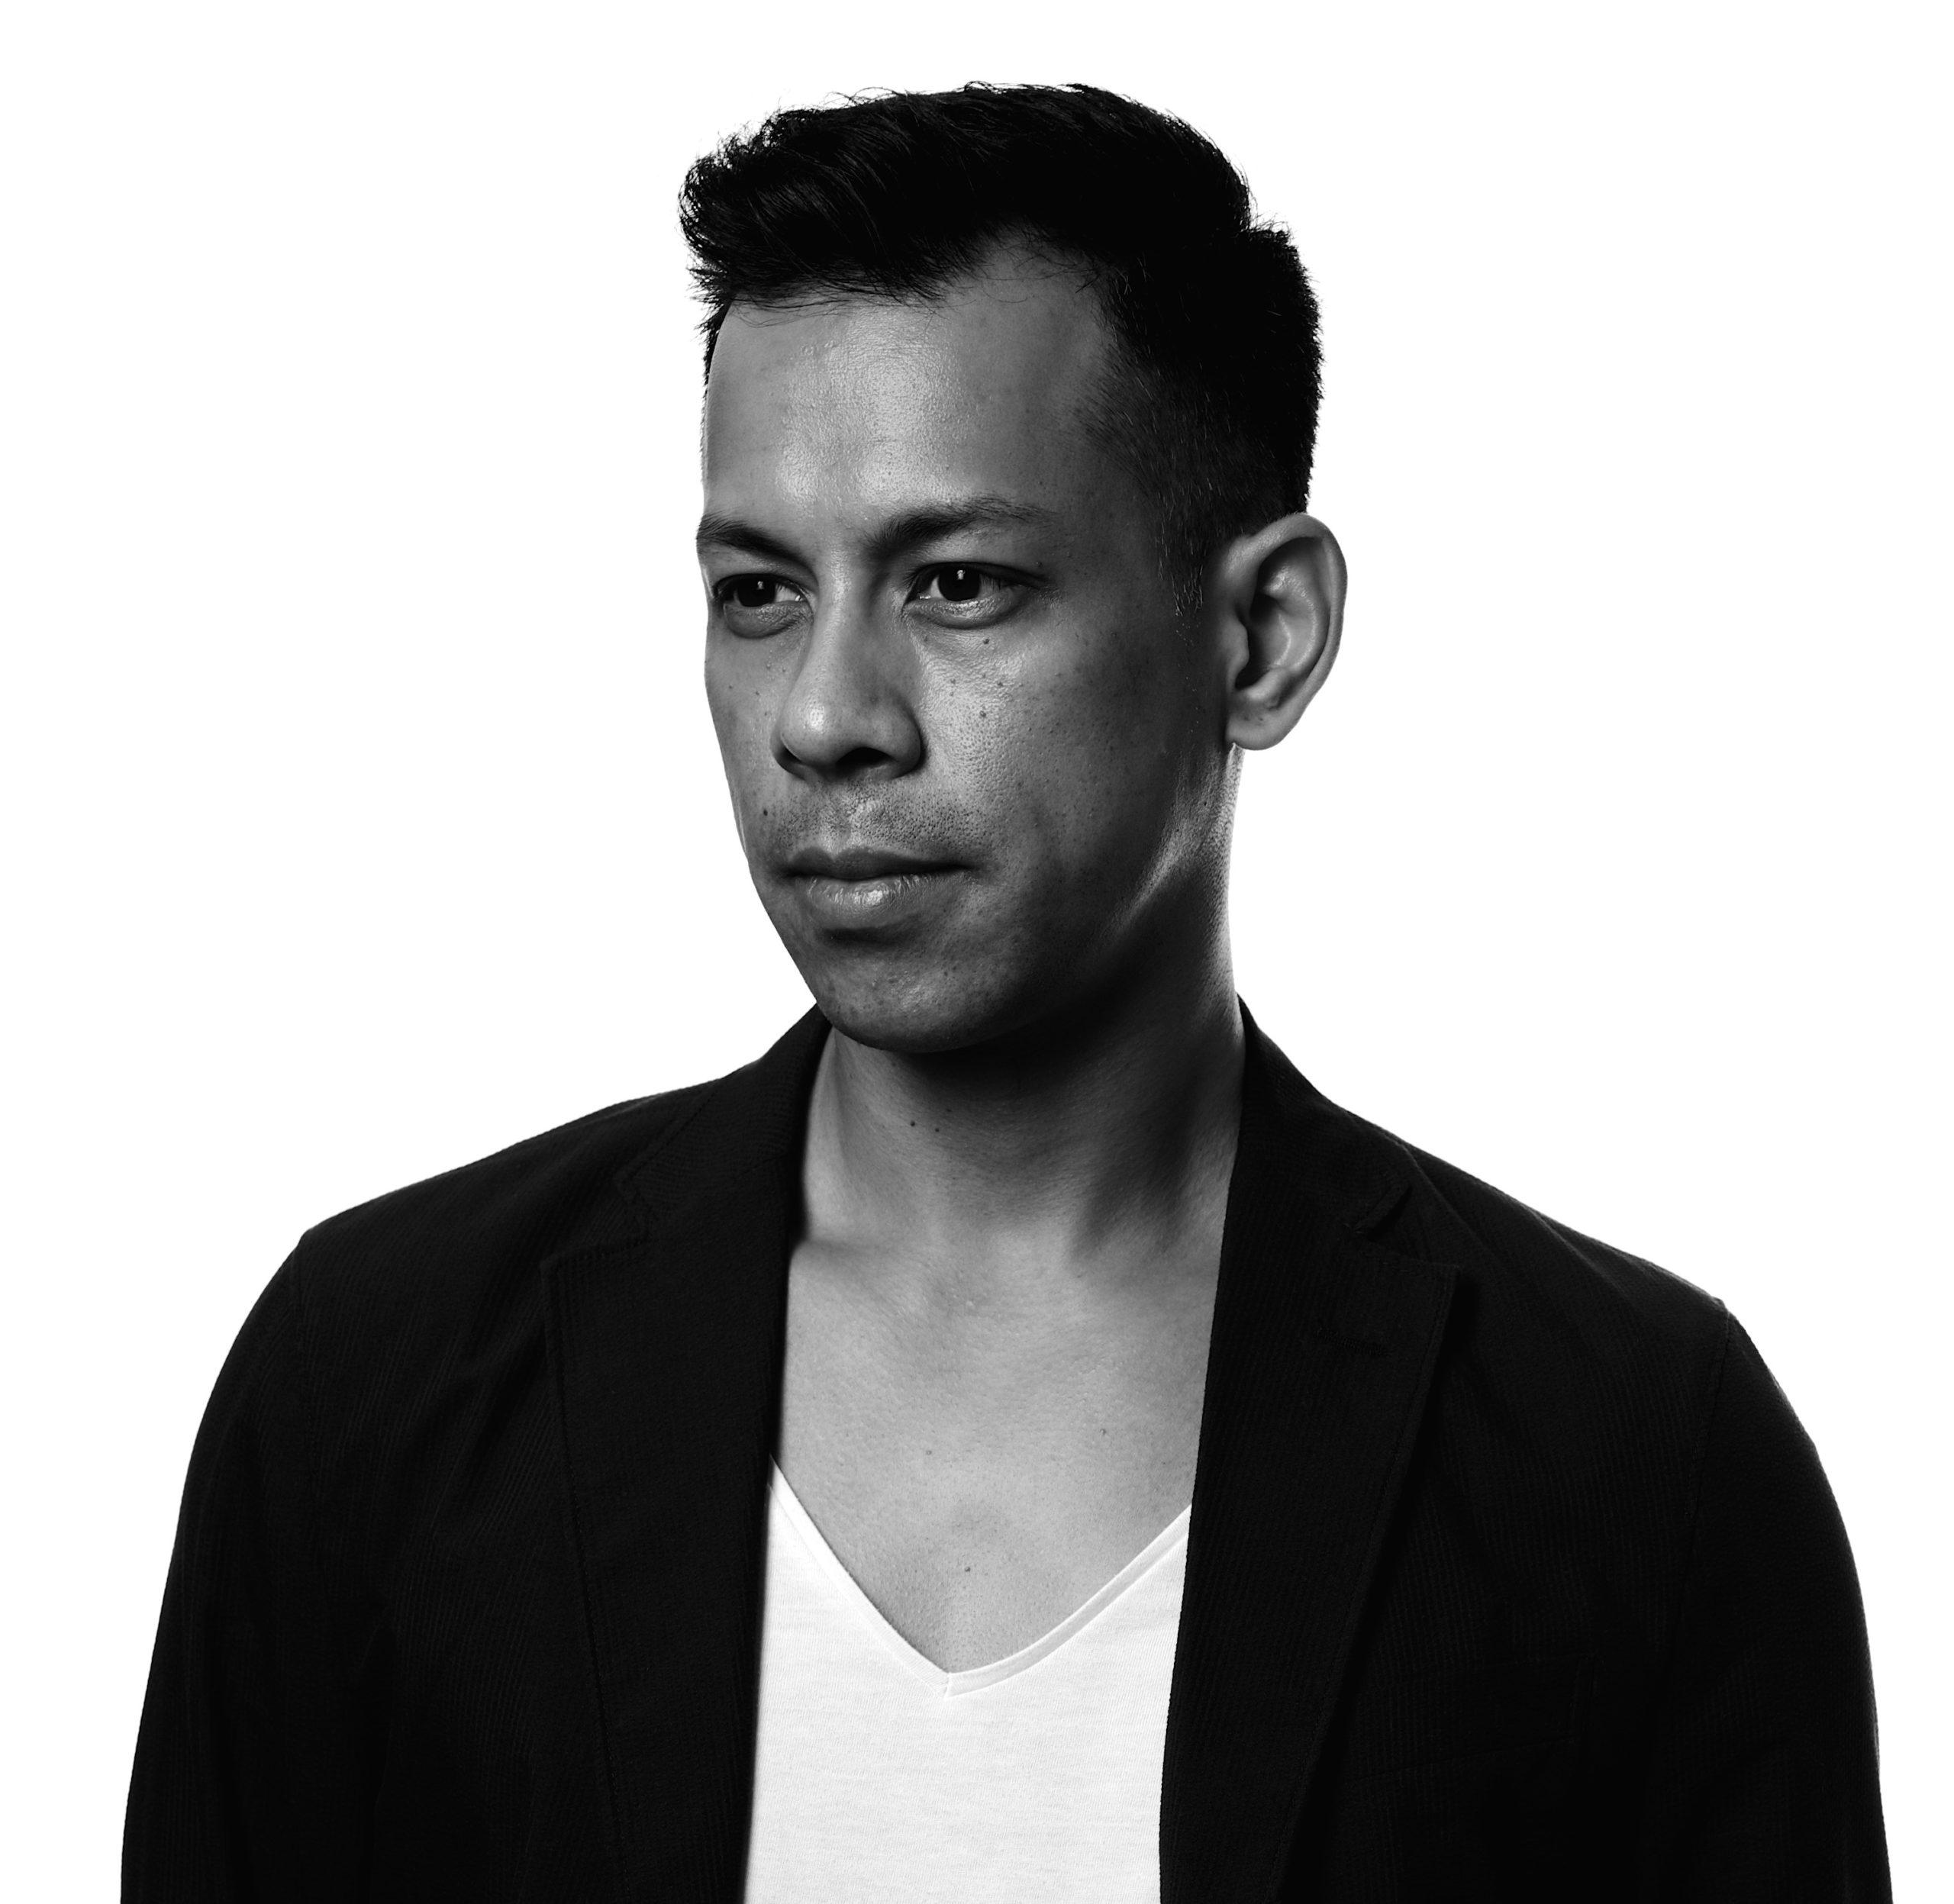 Michael Herrero